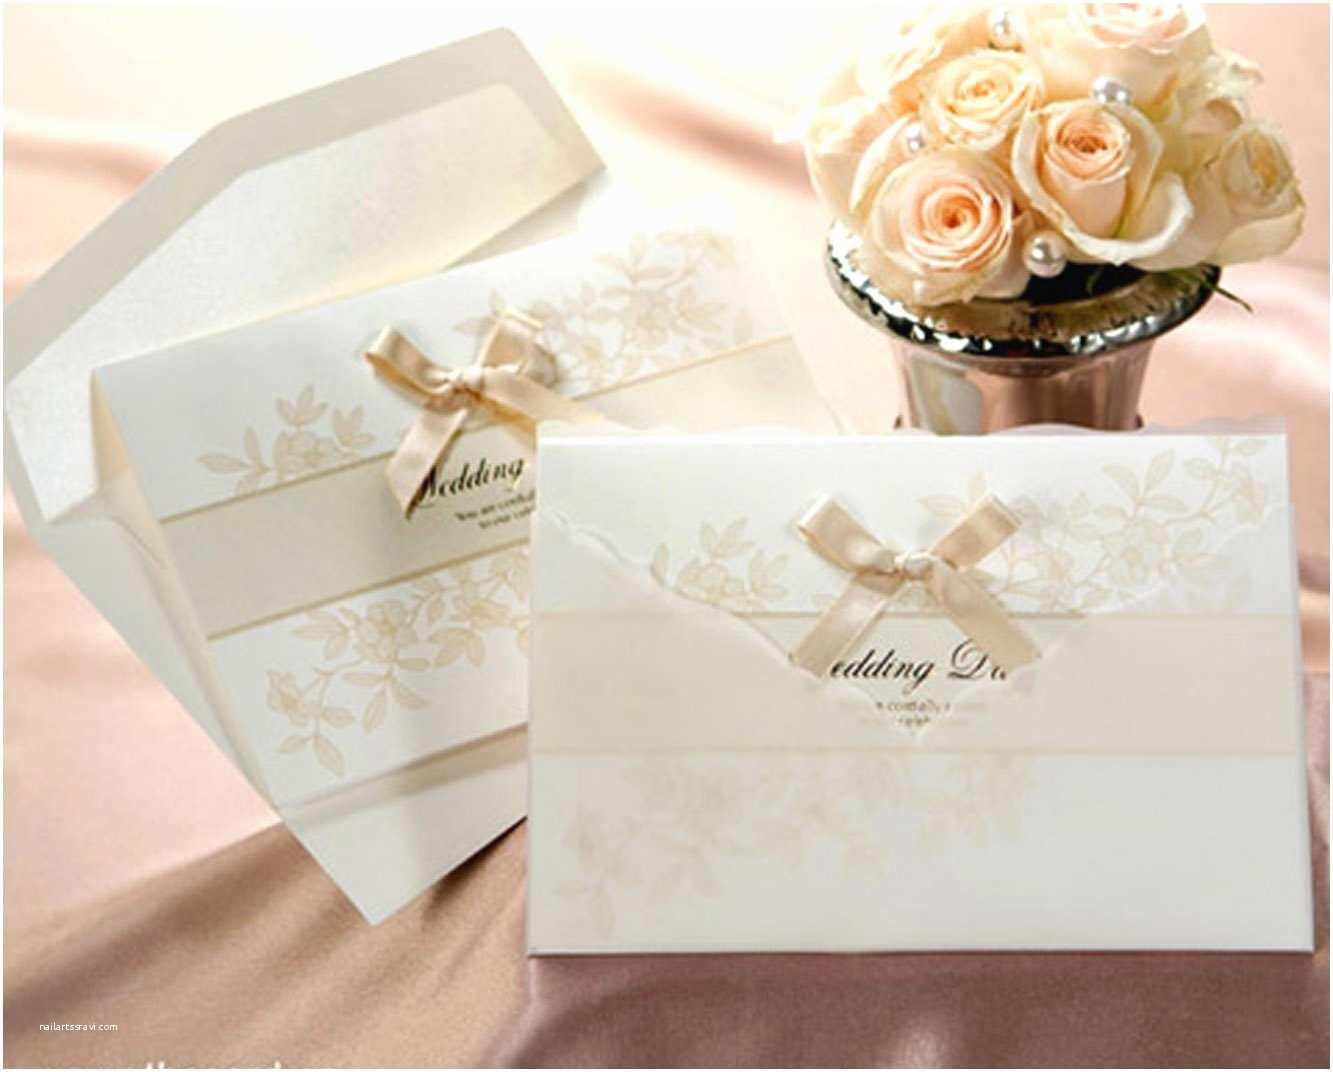 Wedding Invitation Designs Unique Indian Wedding Invitation Cards Designs and Ideas